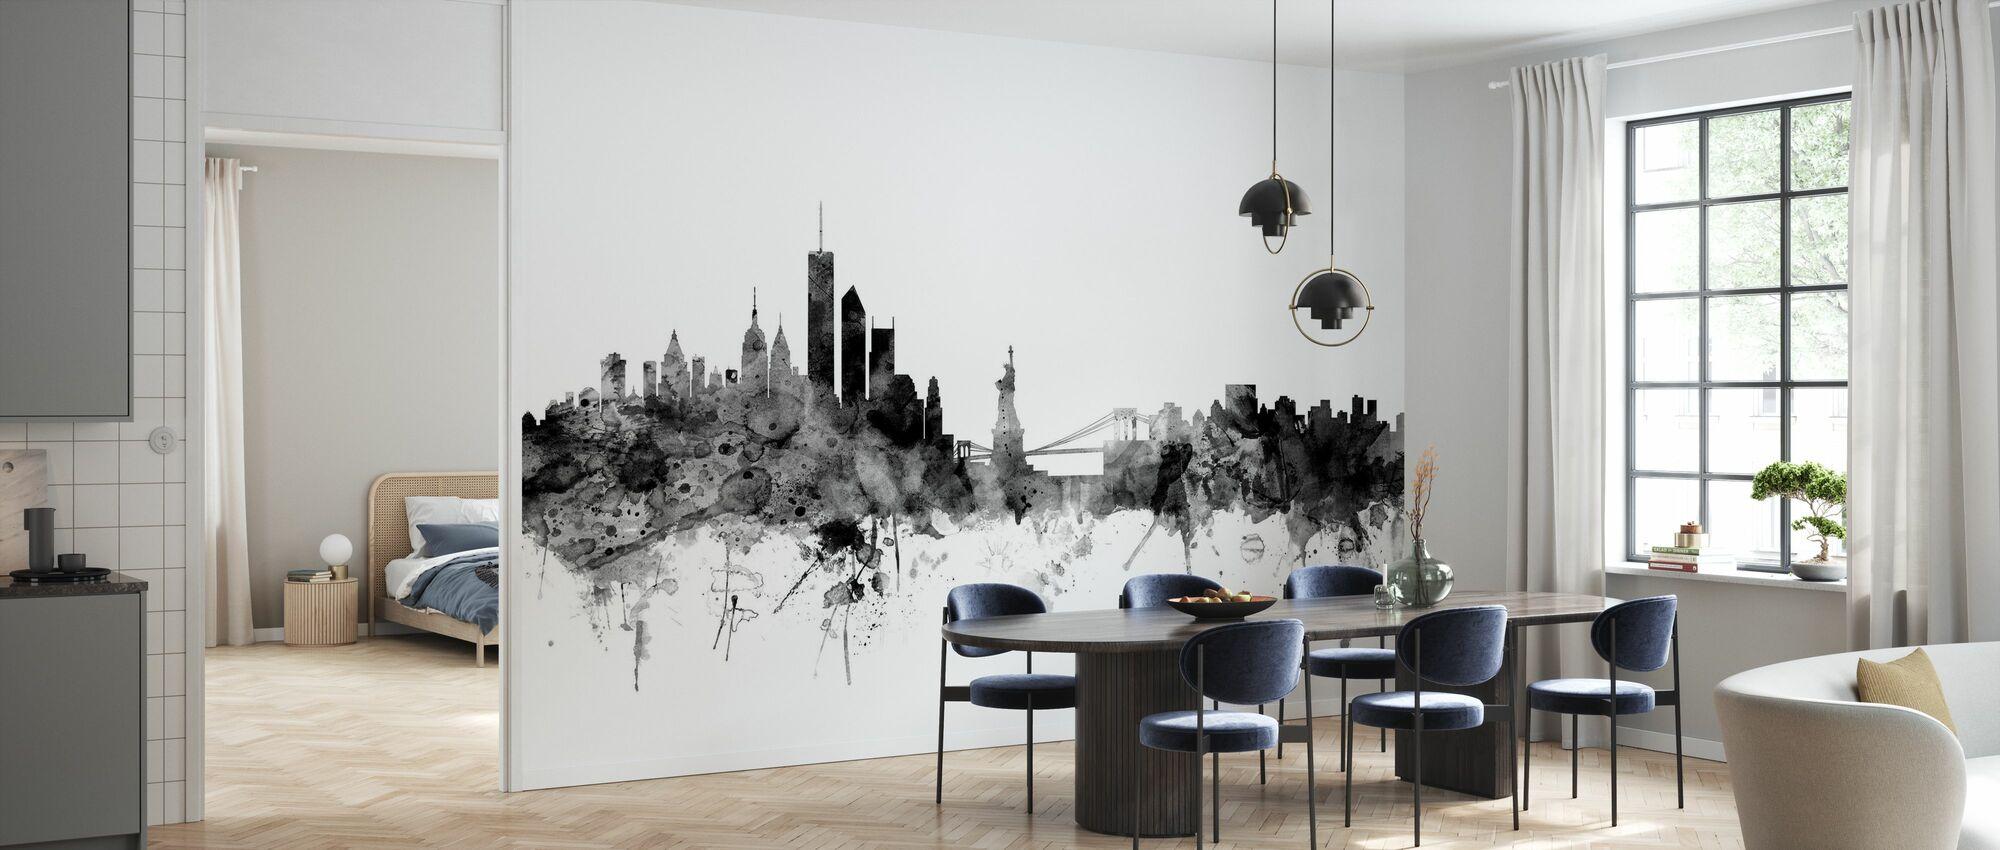 New York Skyline Black - Wallpaper - Kitchen